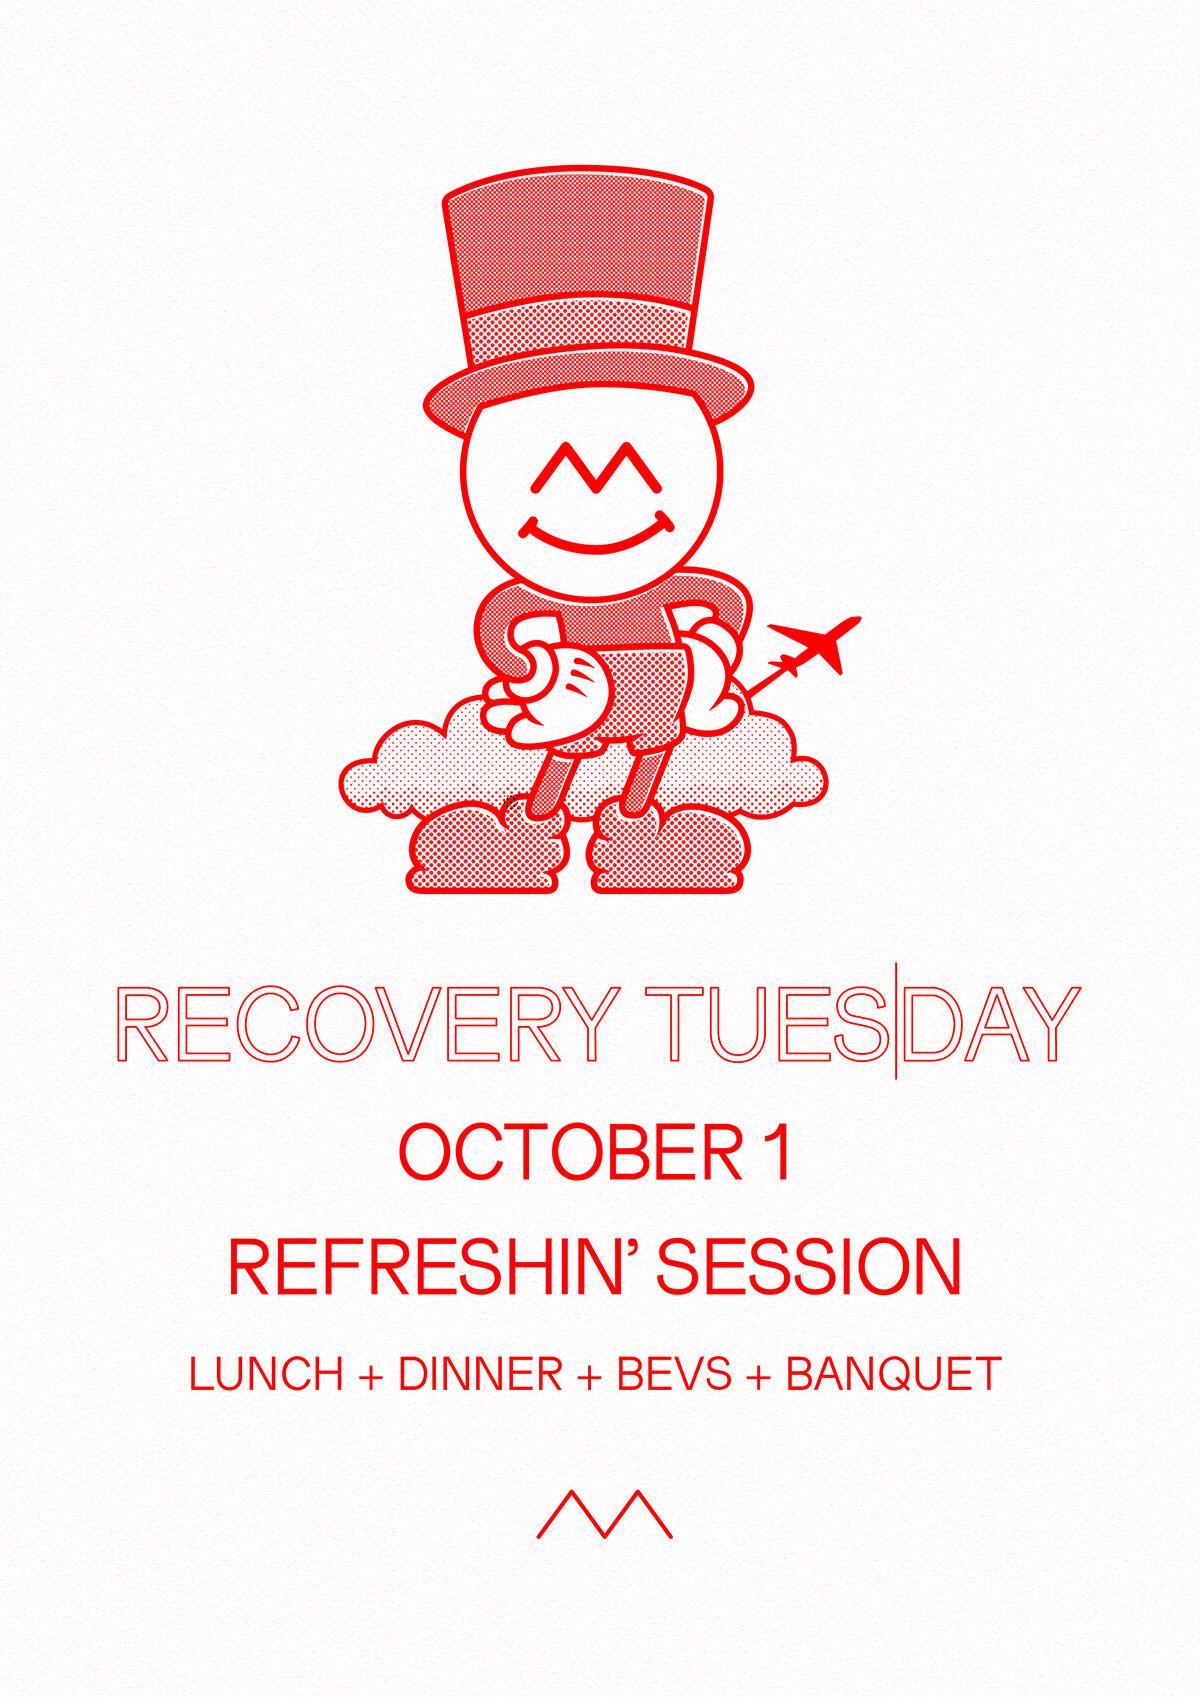 LV_RecoveryTuesday(WEB-STATIC).jpg